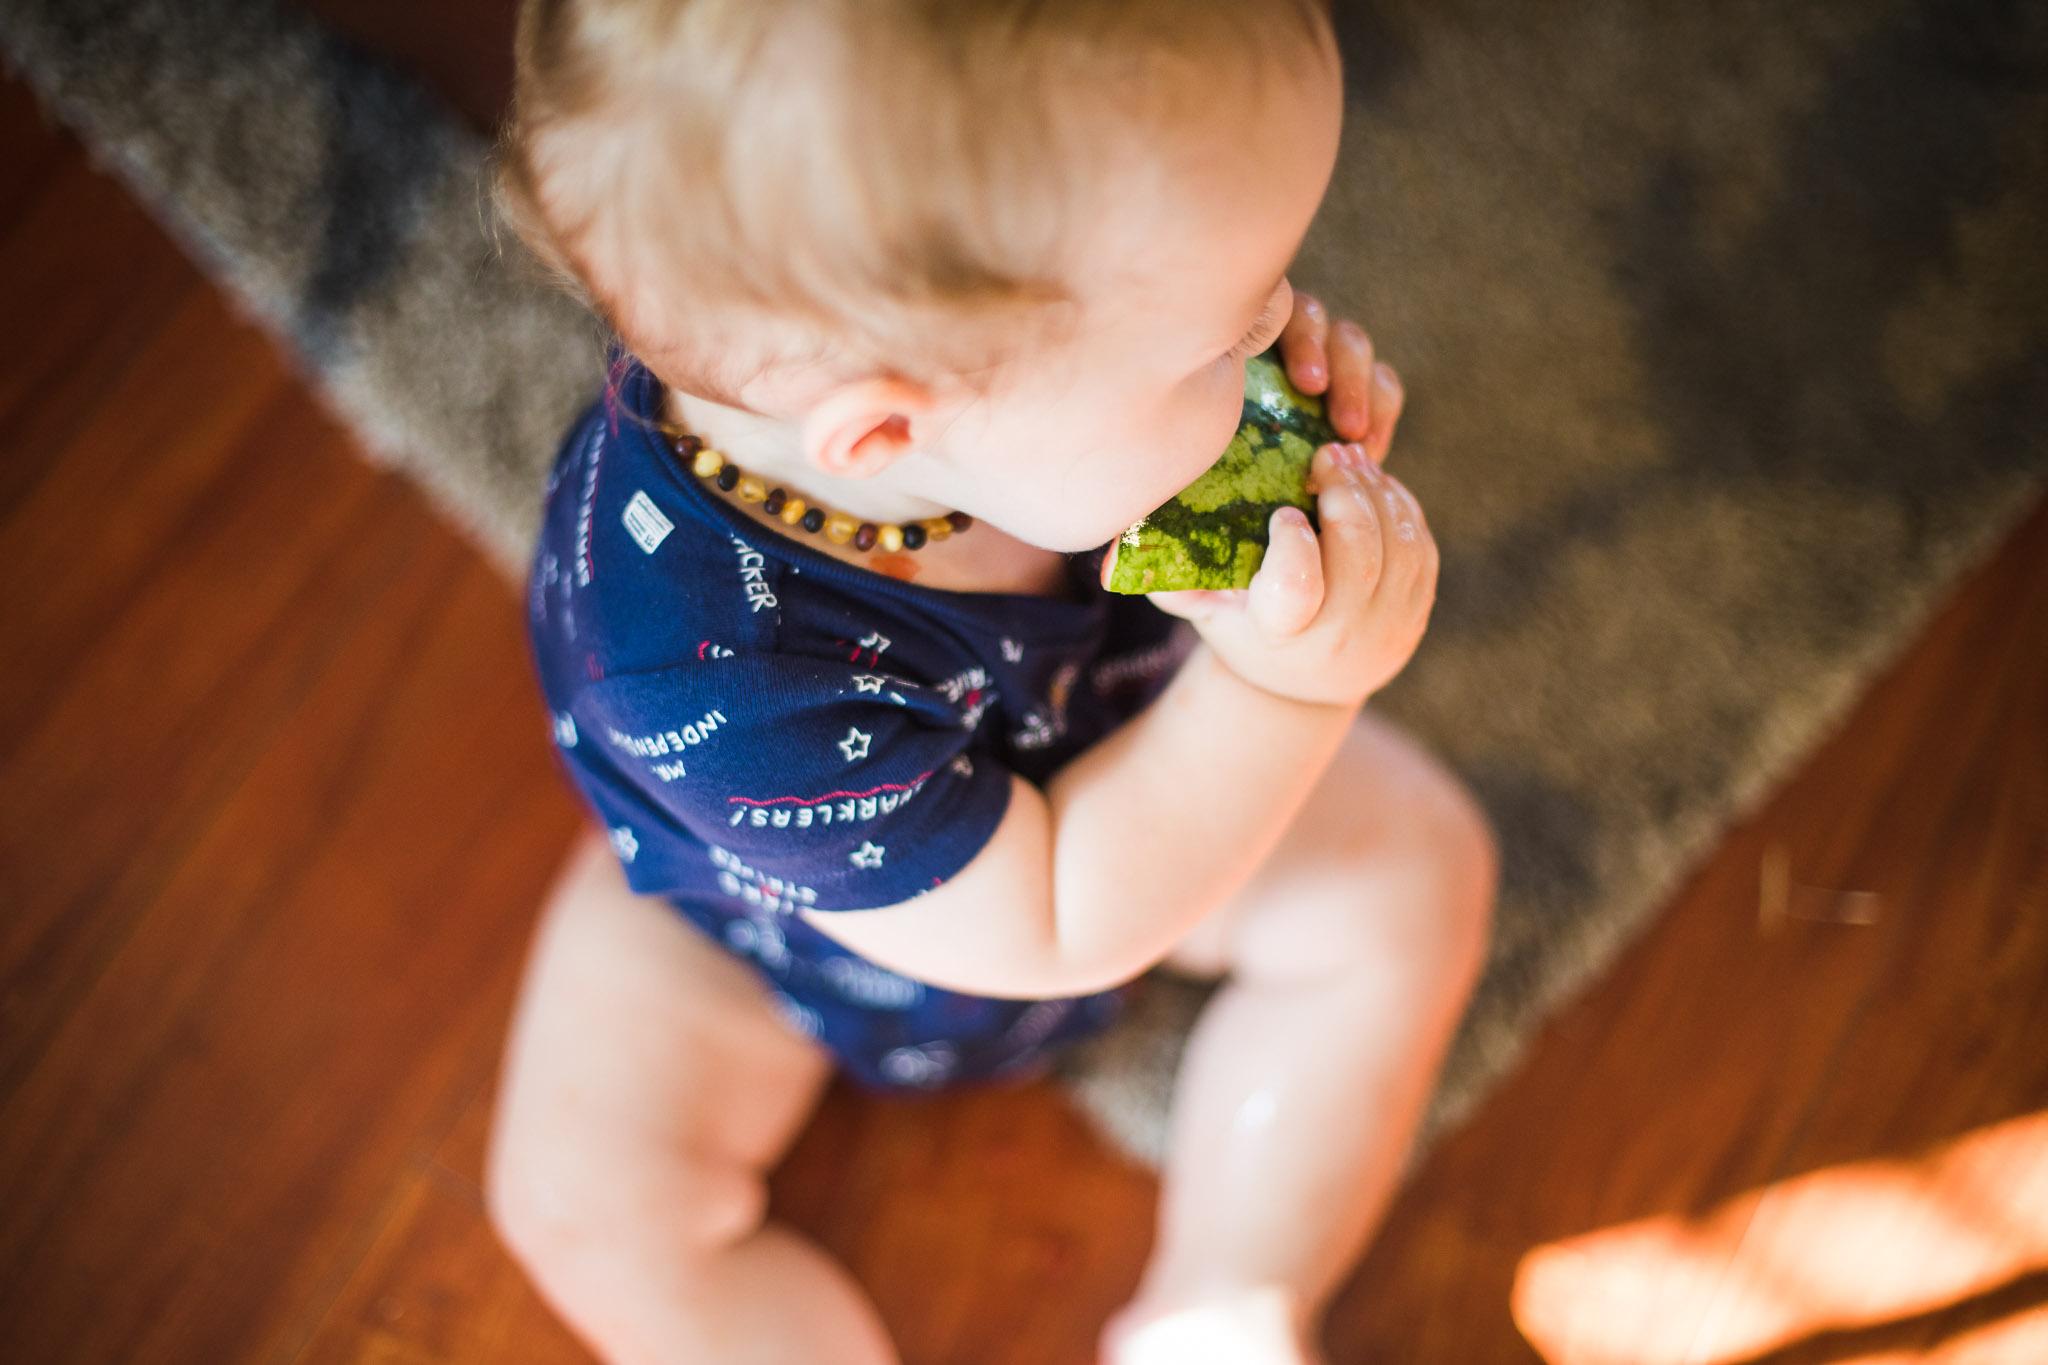 Archer_Inspired_Photography_Watermelon_Baby_Boy_Eating_Lifestyle_Photographer_California-24.jpg